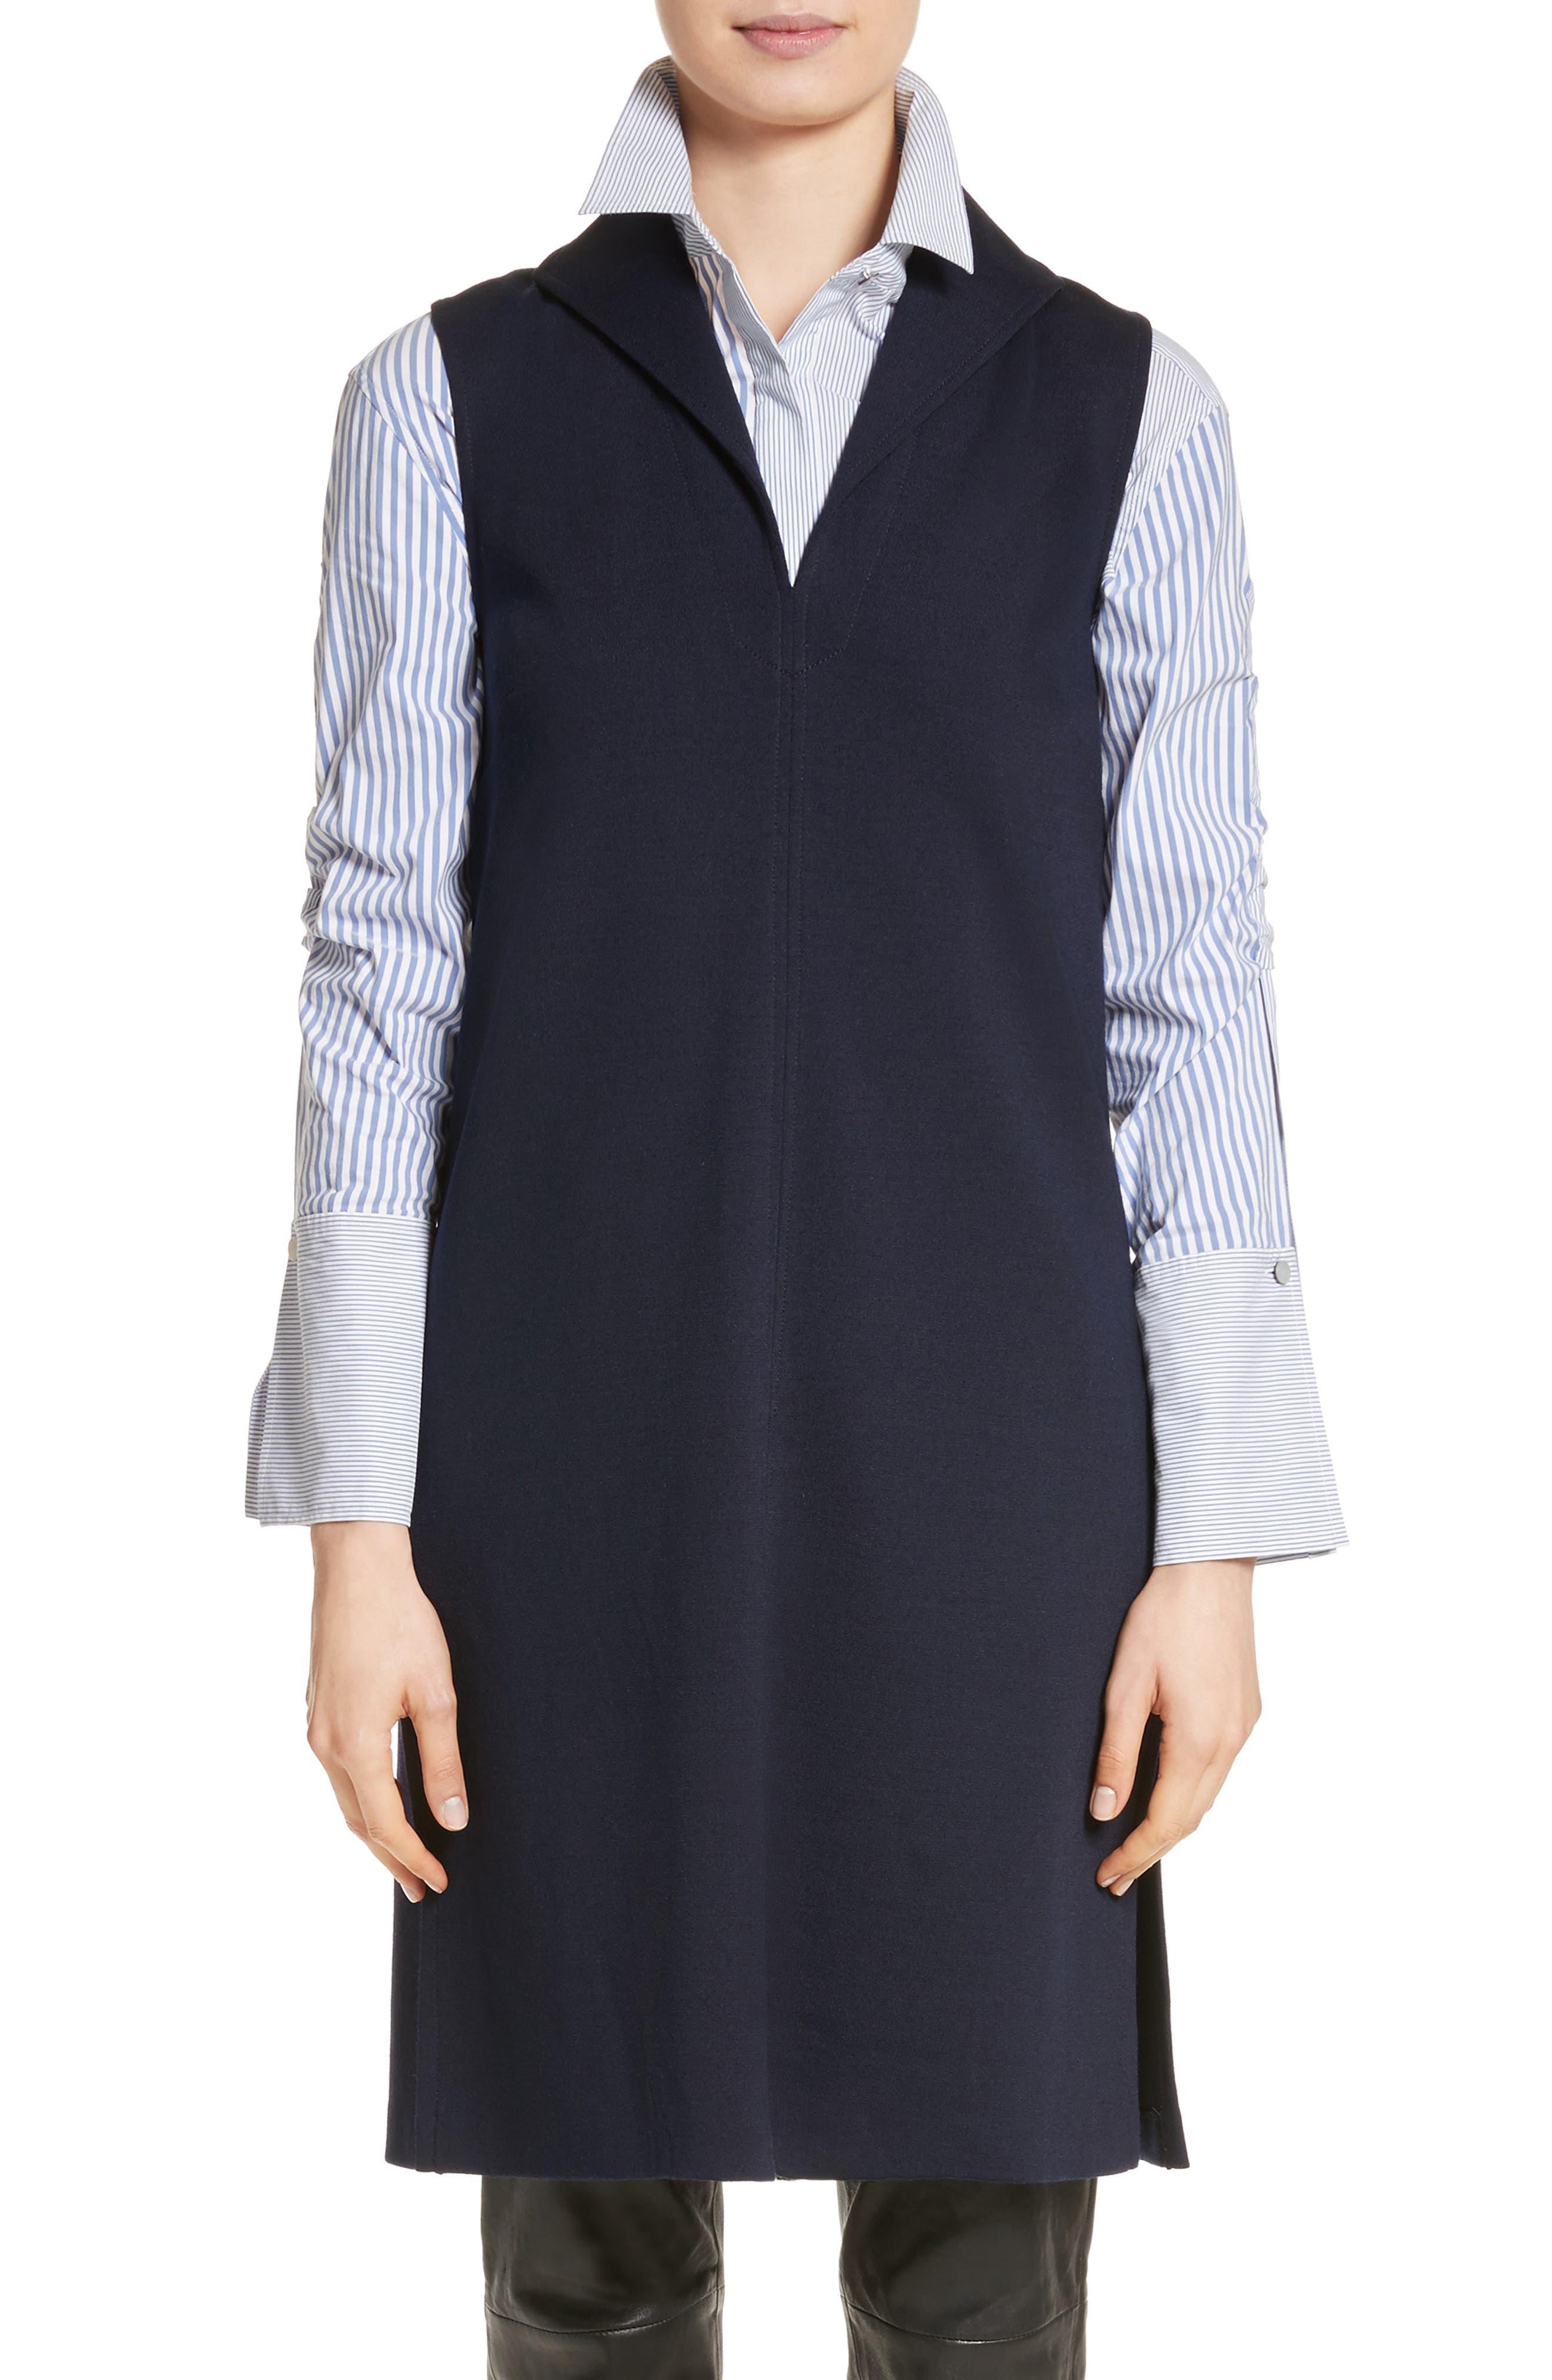 St John Collection Milano Knit Collared Tunic,                             Main thumbnail 1, color,                             Navy